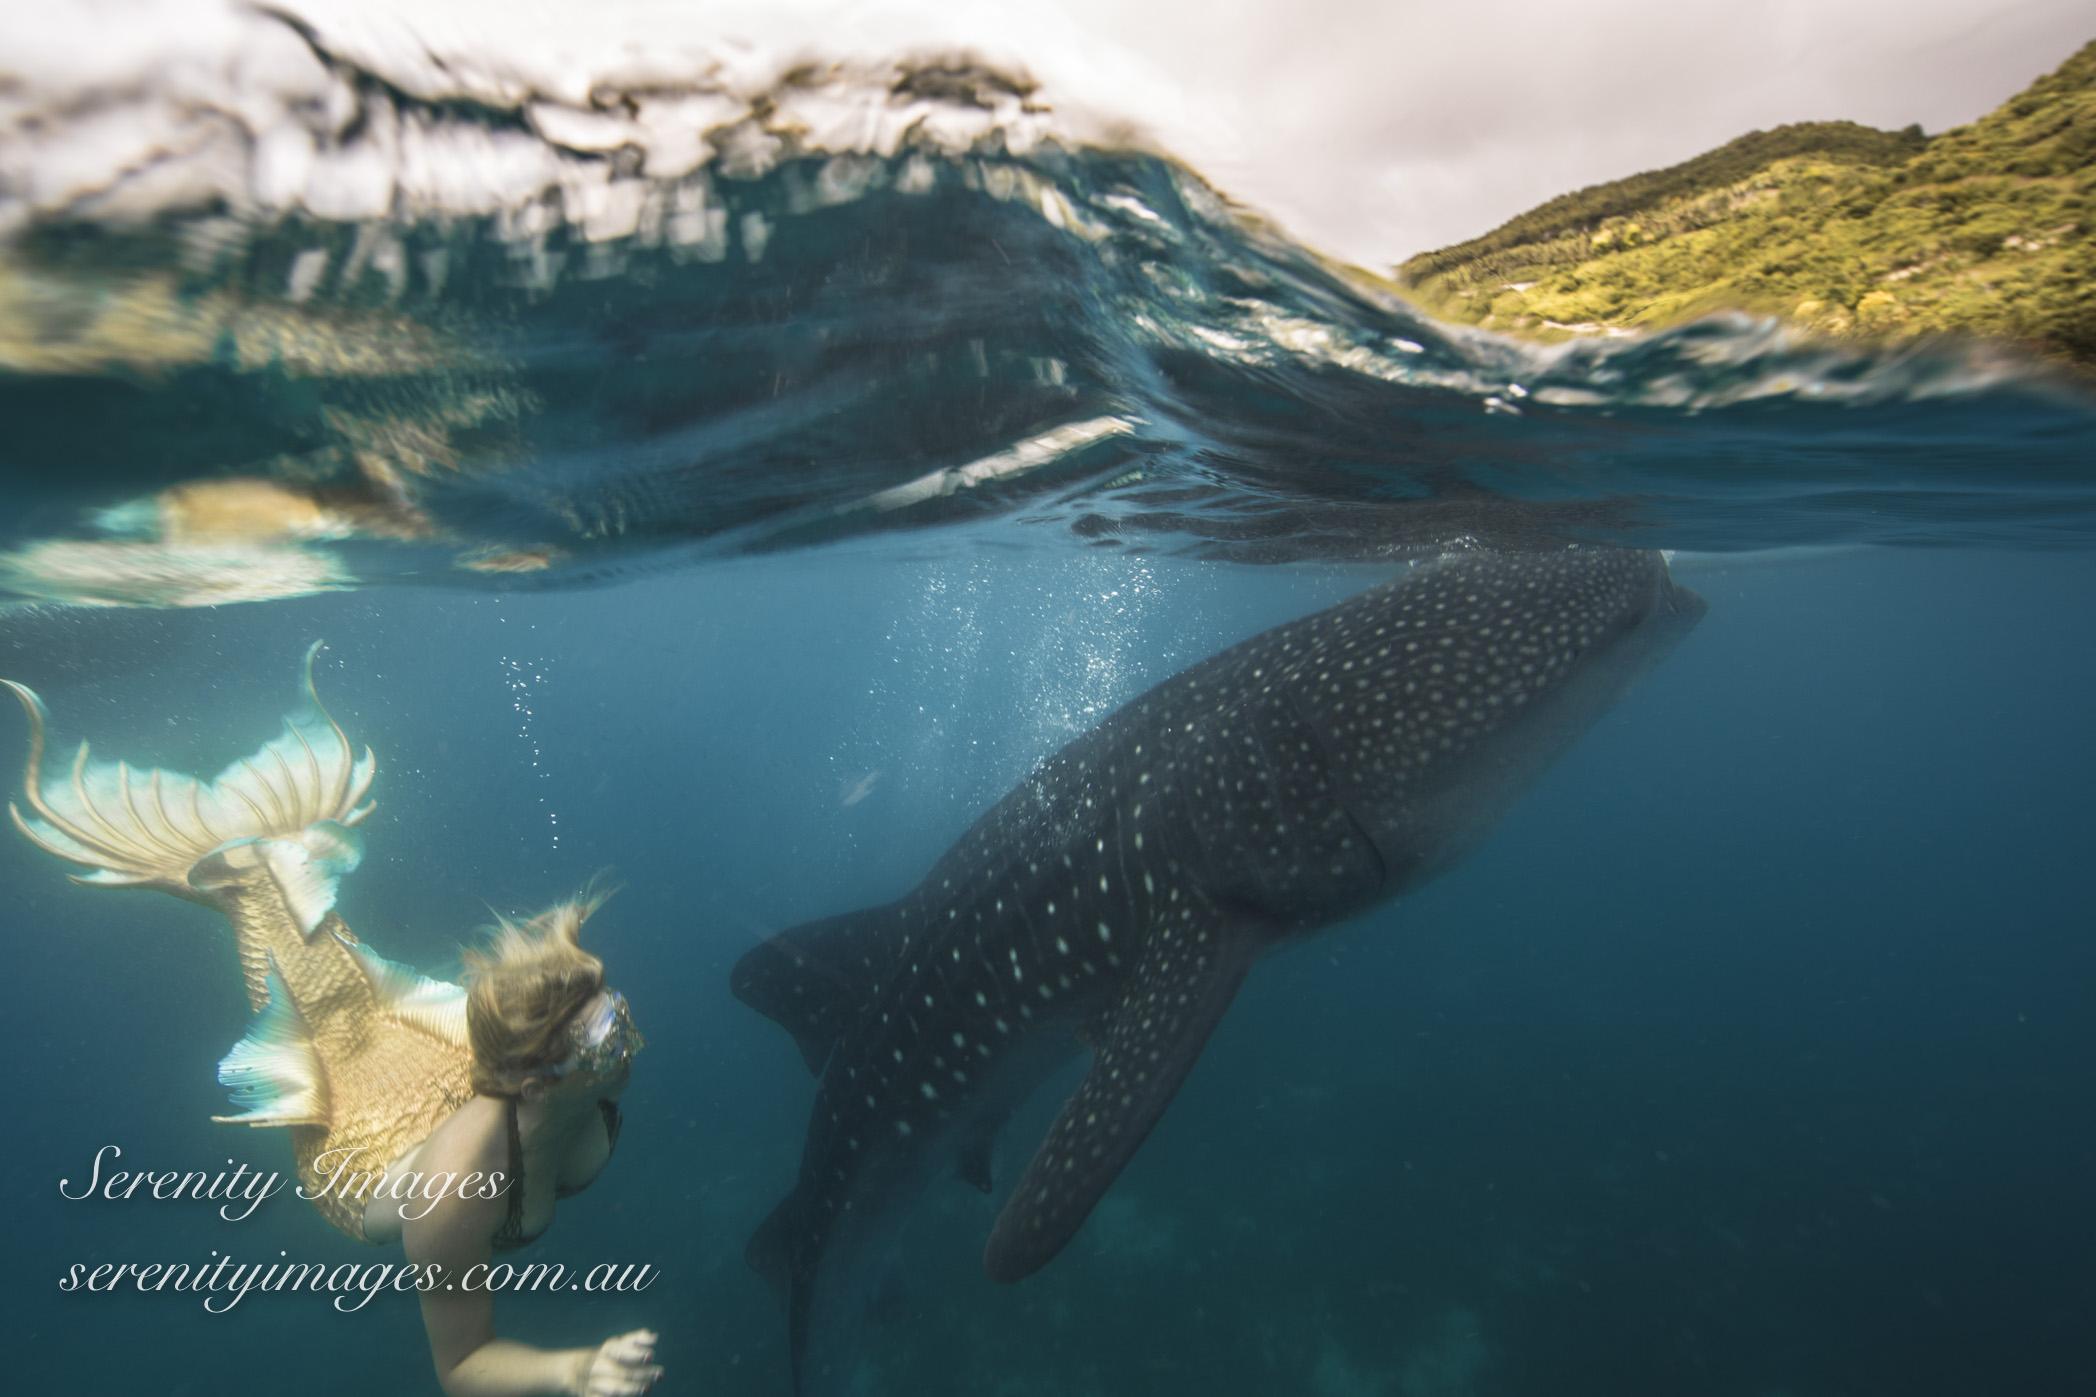 Mermaid Bonnie Wale Shark SI-7608